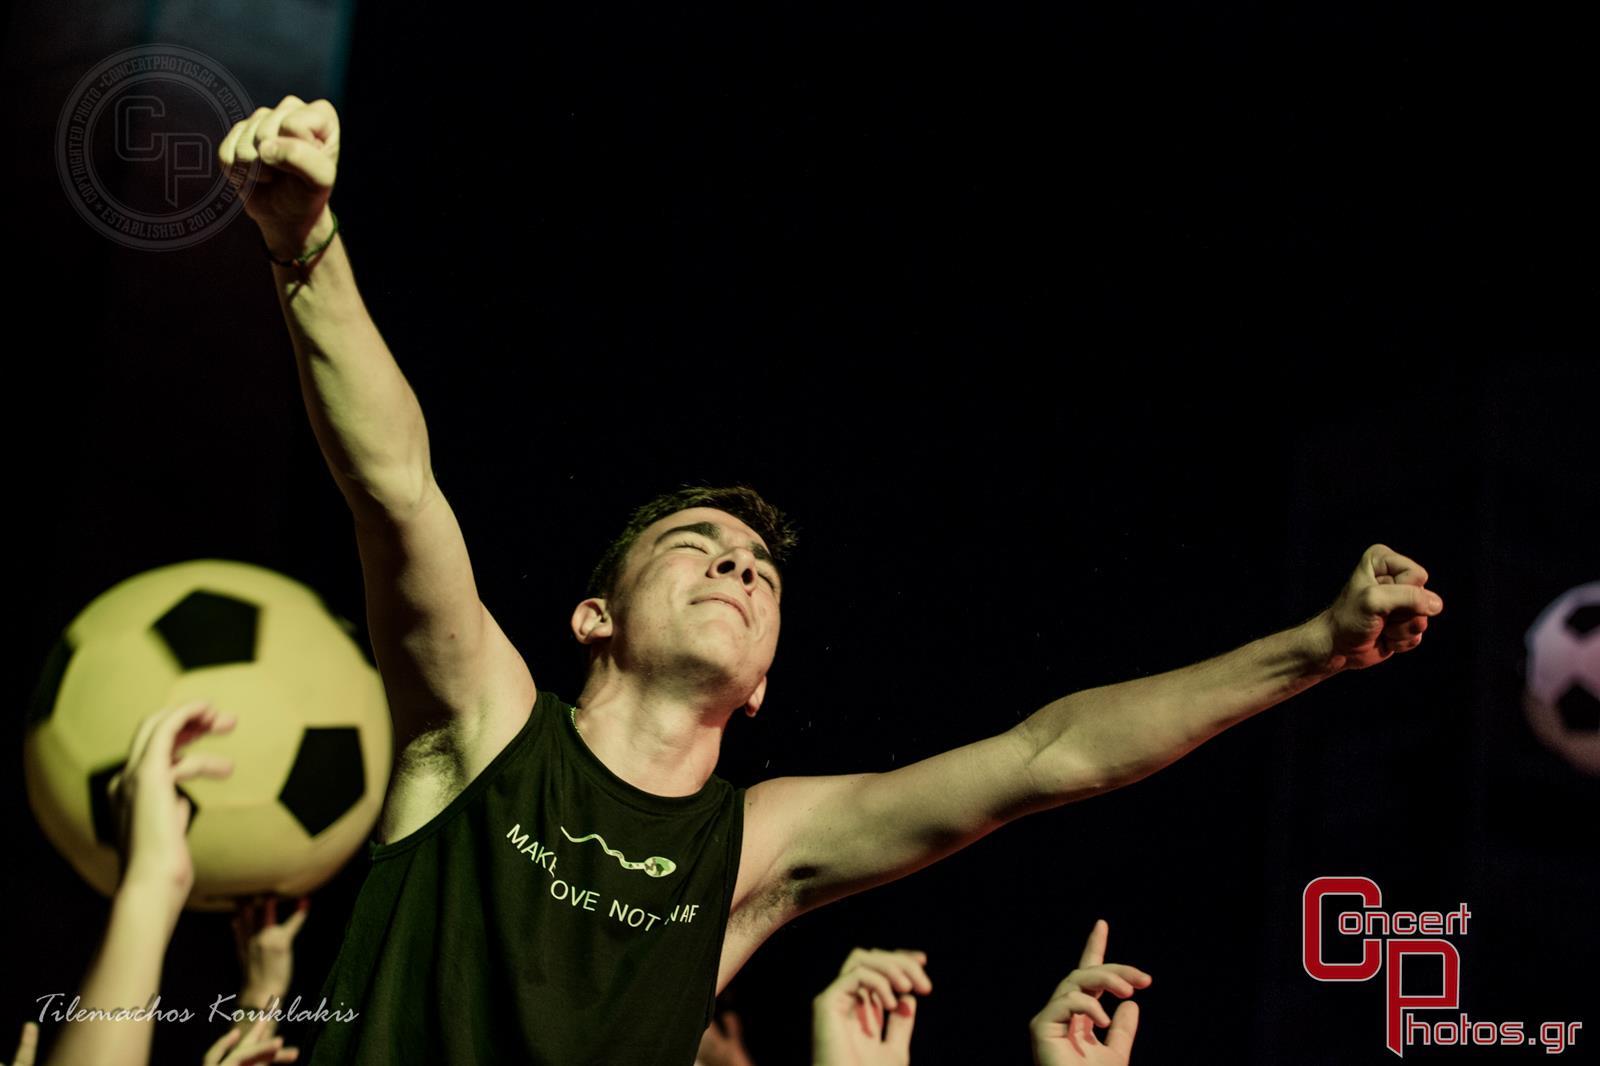 Locomondo & The Jaguar Bombs-Locomondo The Jaguar Bombs photographer:  - concertphotos_20140905_22_42_55